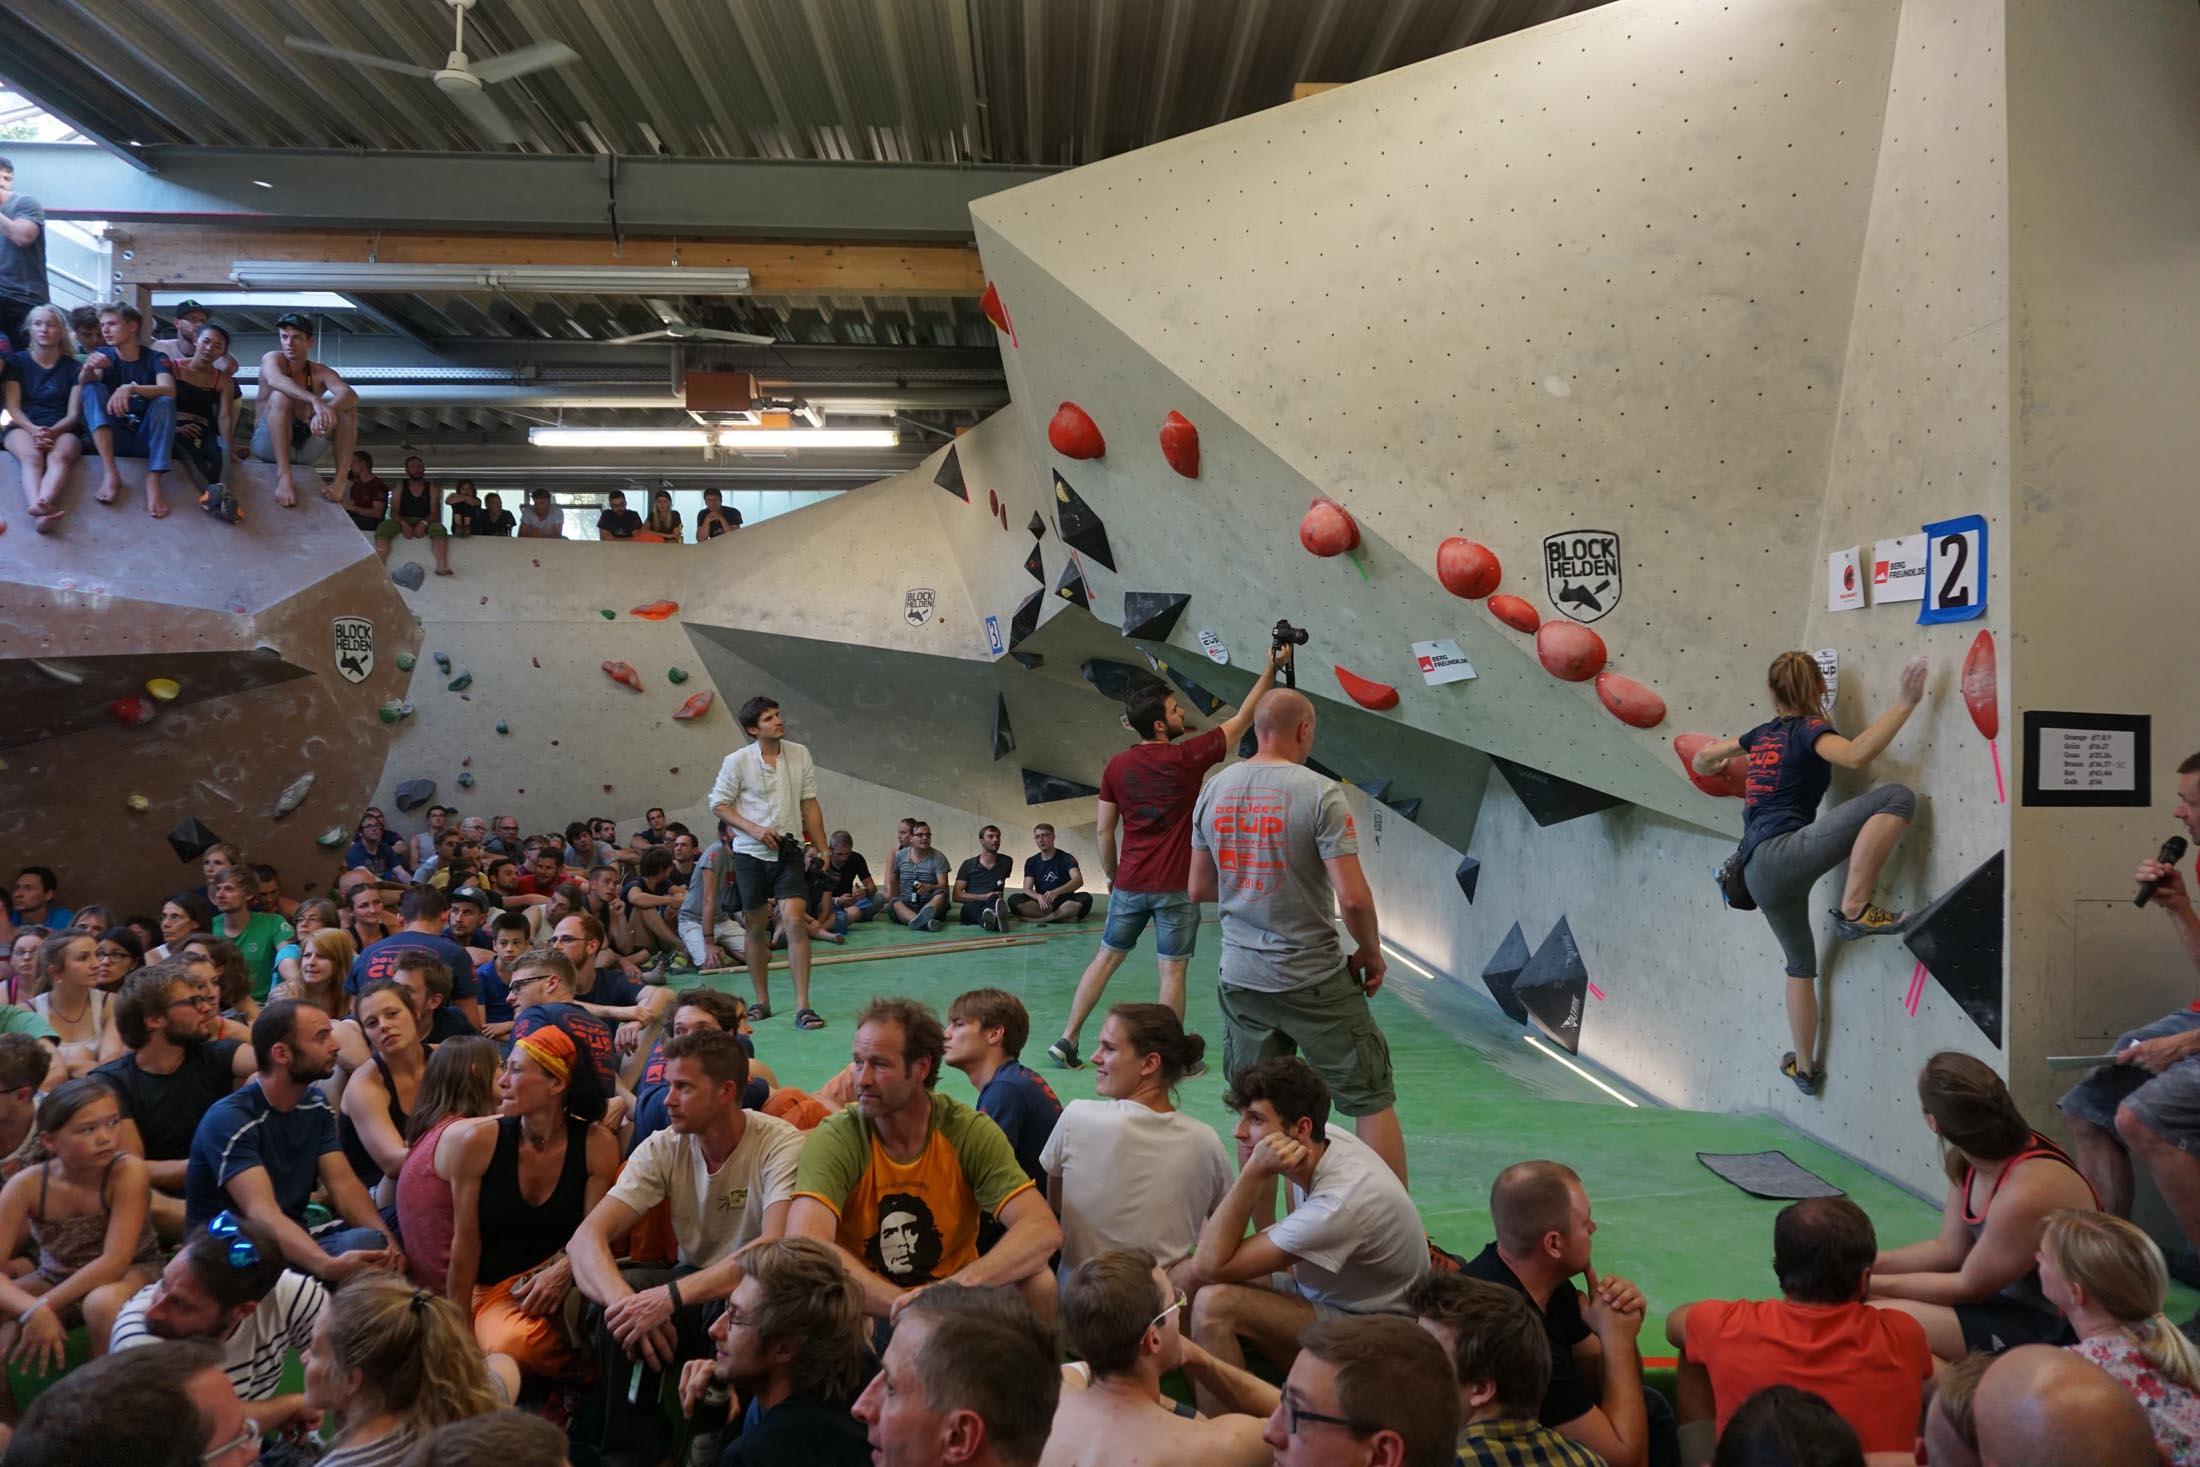 Finale, internationaler bouldercup Frankenjura 2016, BLOCKHELDEN Erlangen, Mammut, Bergfreunde.de, Boulderwettkampf07092016625